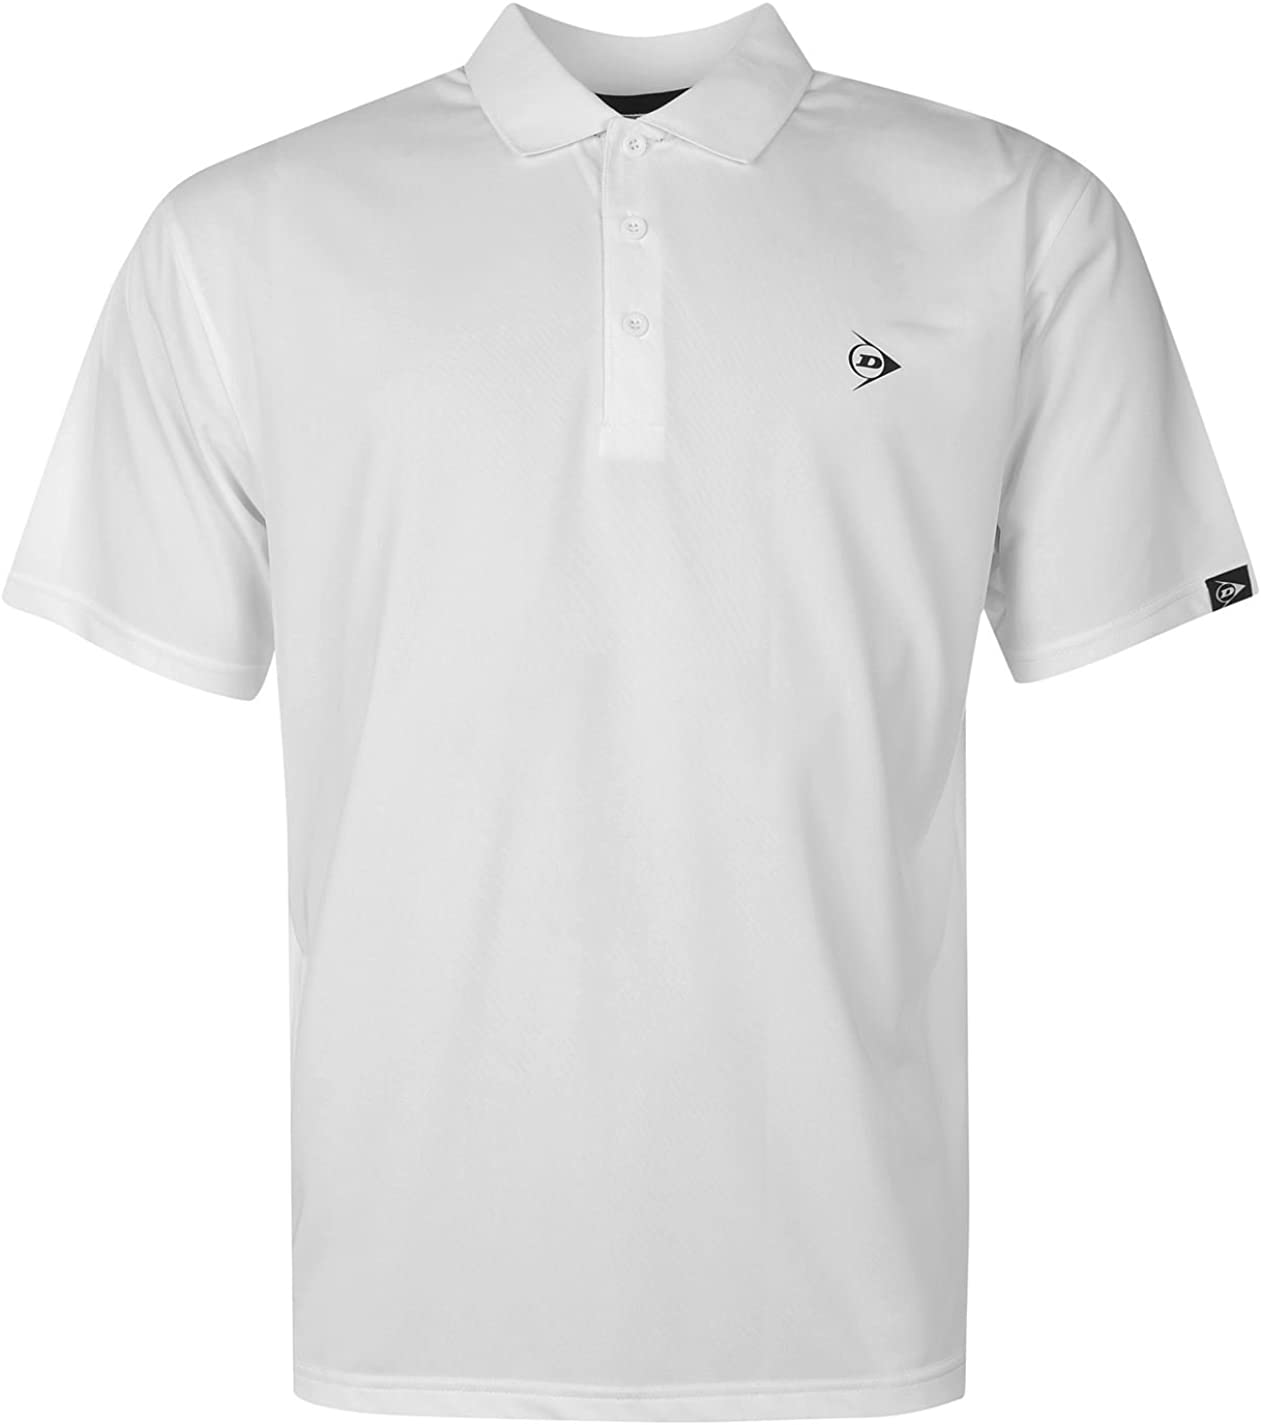 Dunlop - Polo - Manga corta - para hombre blanco X-Large: Amazon ...